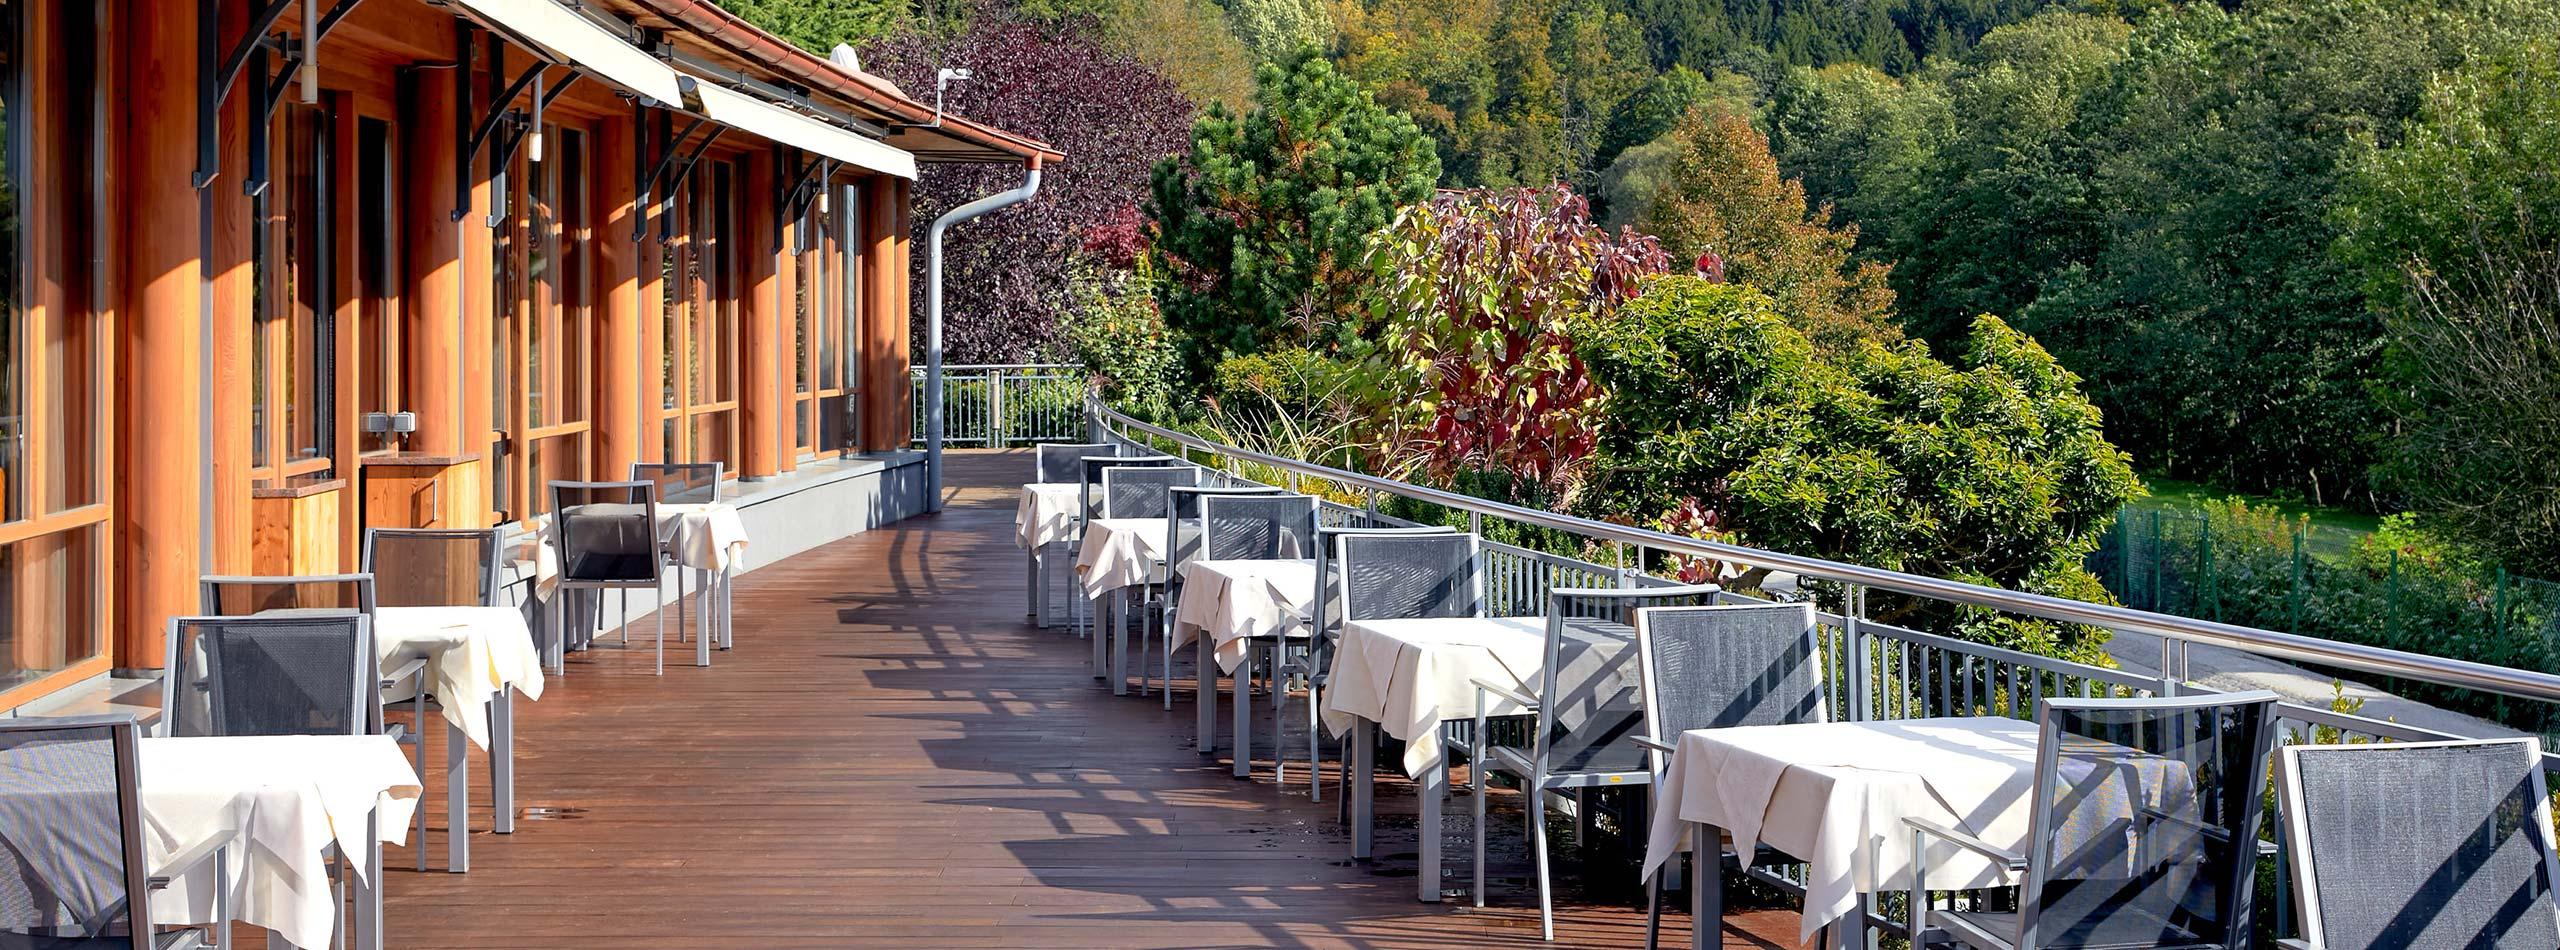 Our hotel in Bad Waltersdorf – the Mandira's sun terrace